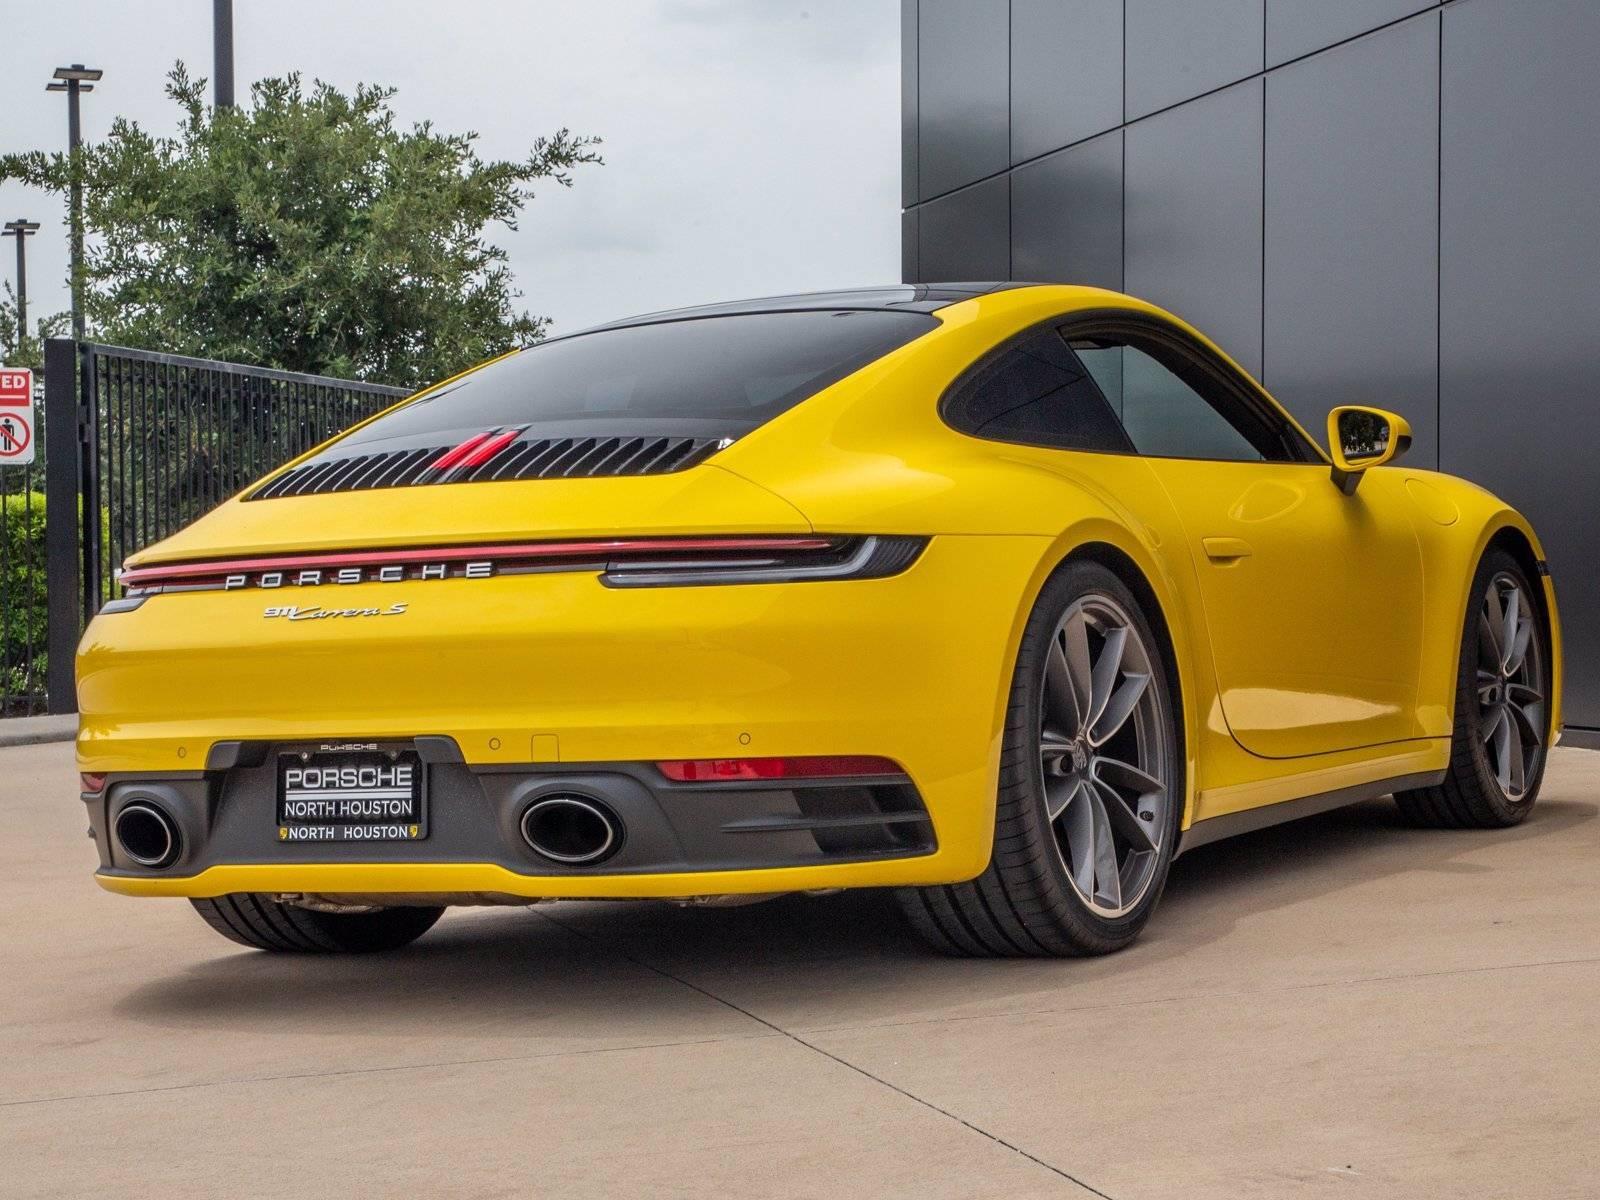 2020 Porsche 911 Carrera S (992) – 5